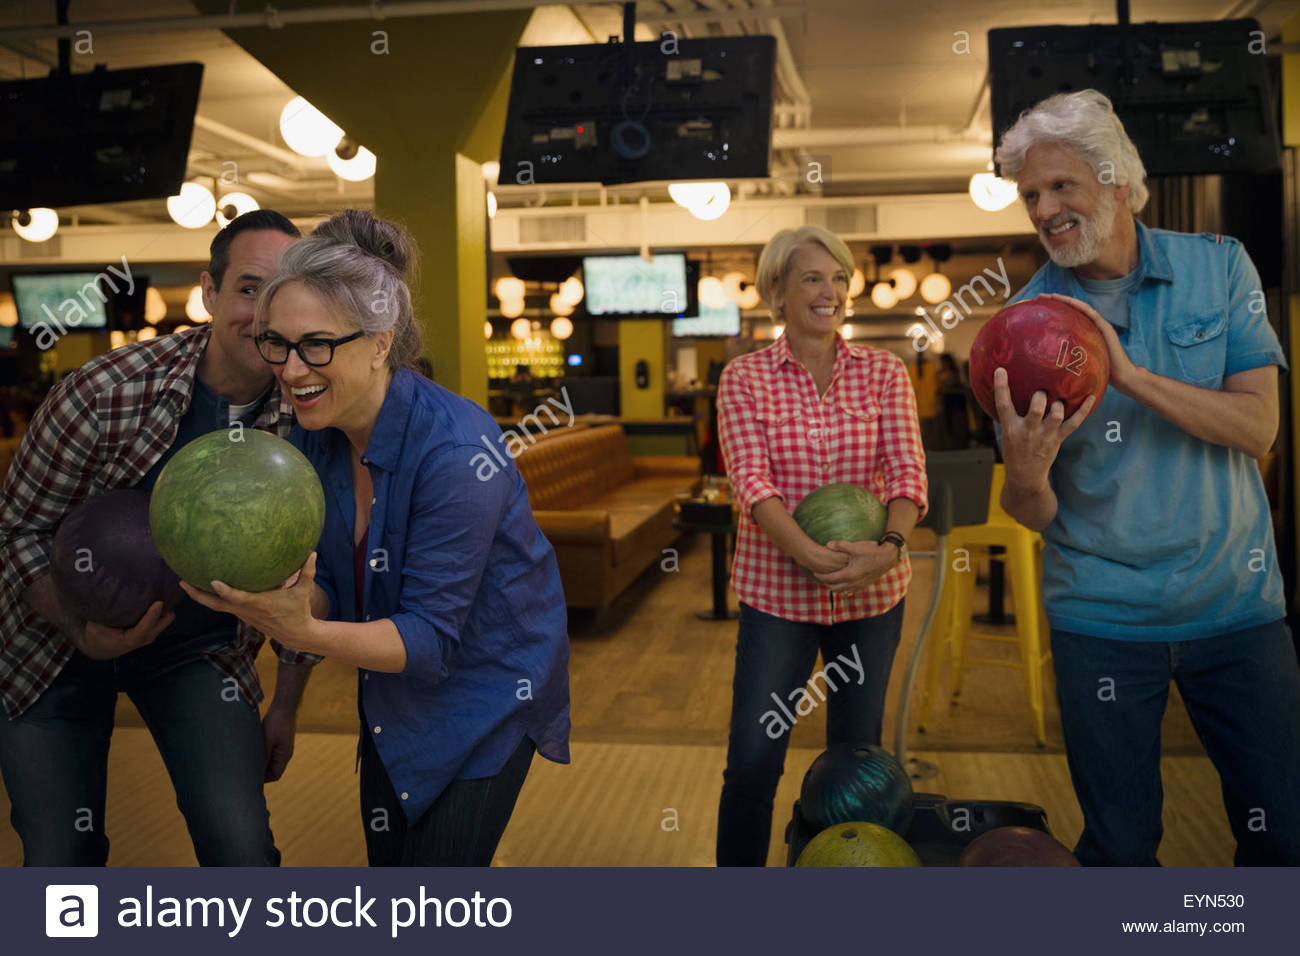 Amici a bowling Bowling Immagini Stock